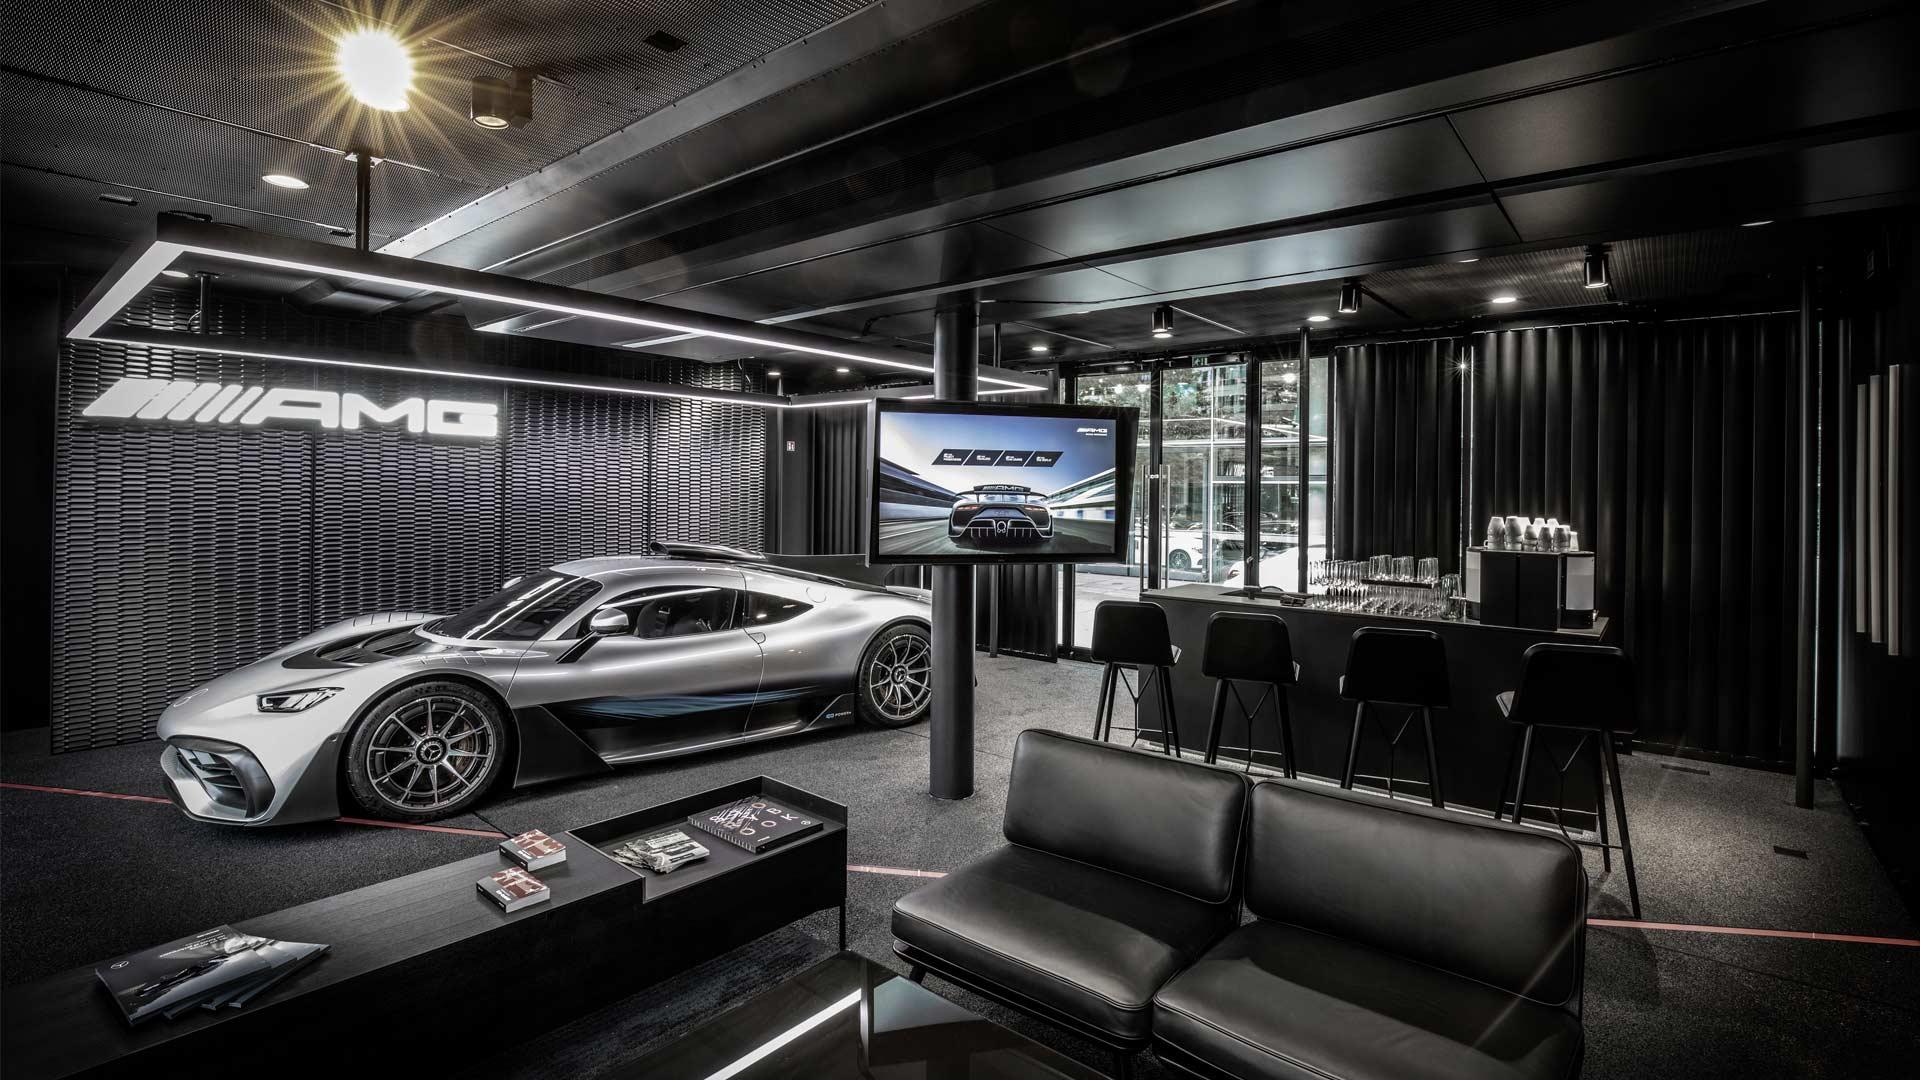 Mercedes-AMG-One-mobile-showroom-lounge